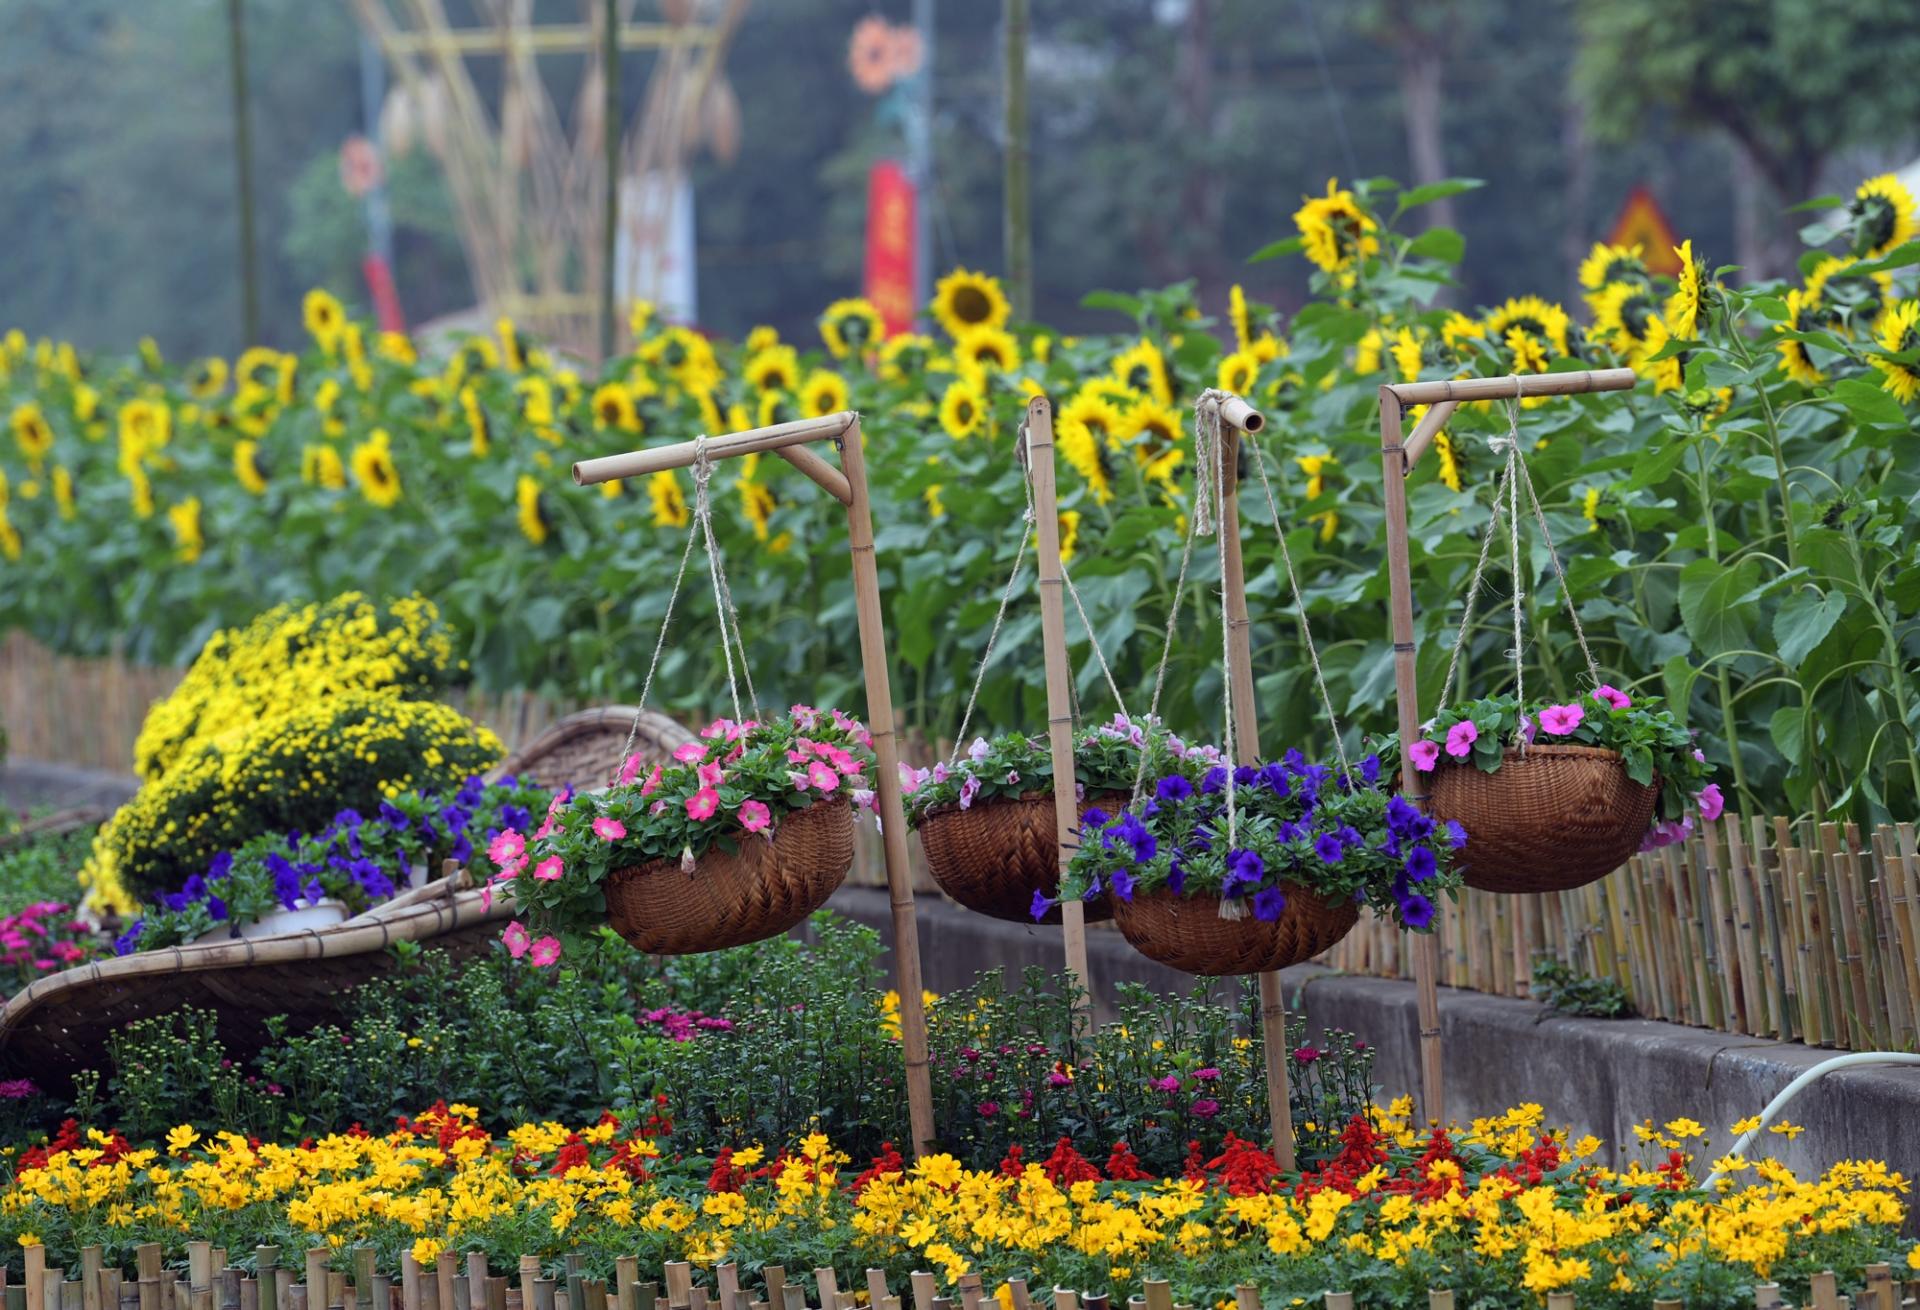 flower street opens at splendora urban area to celebrate lunar new year holiday